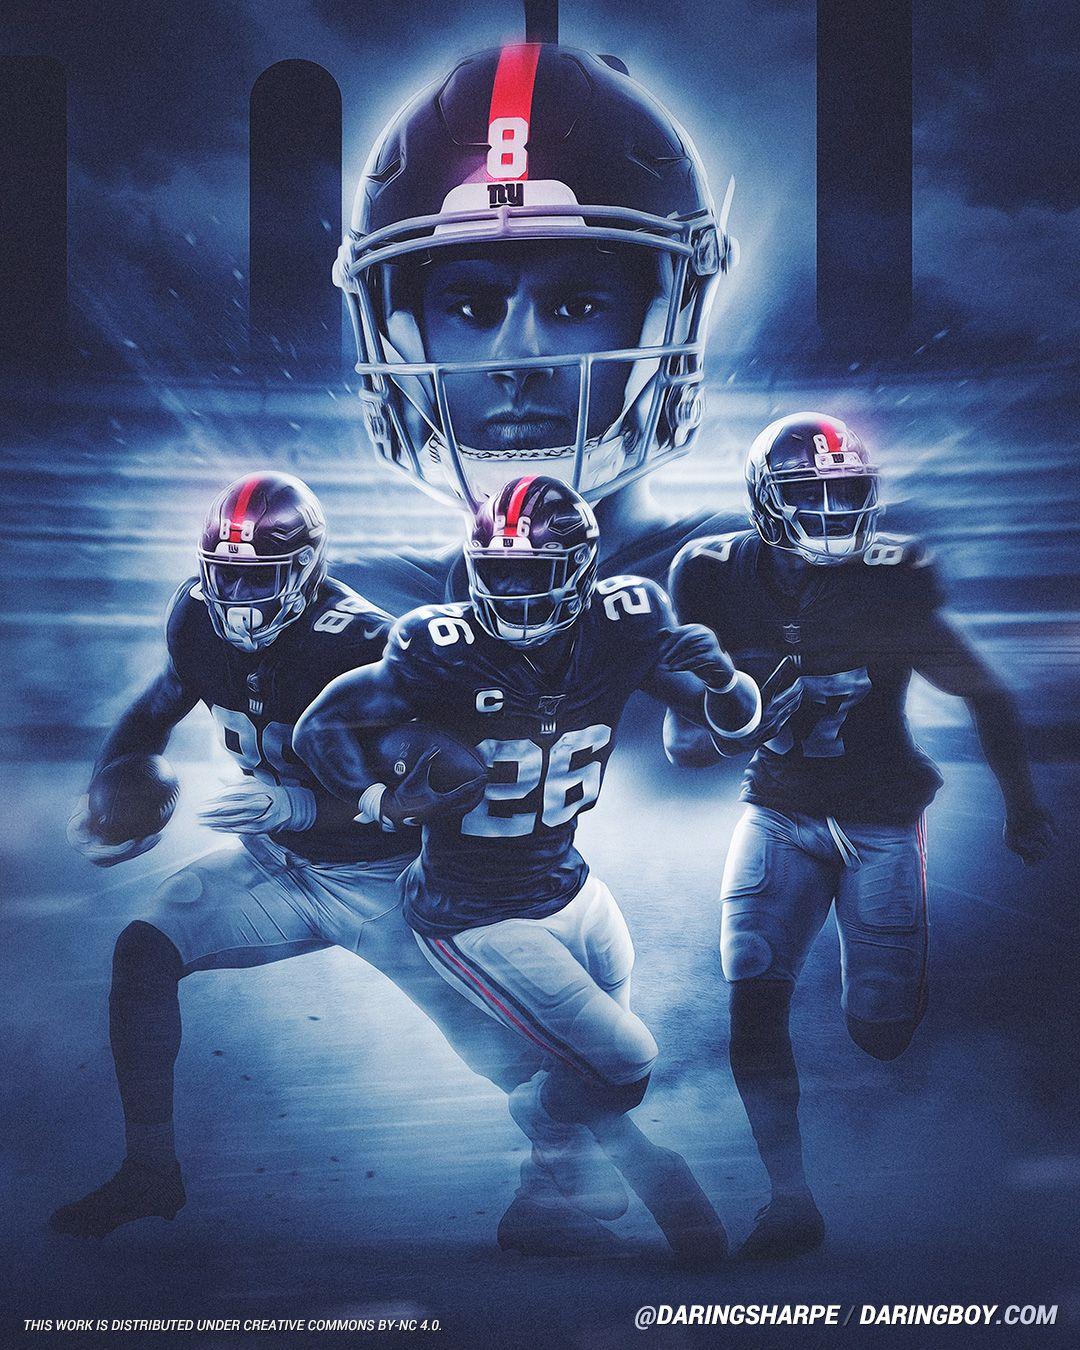 Daniel Jones Saquon Barkley Sterling Shepard Evan Engram New York Giants New York Giants Ny Giants Football Nfl New York Giants